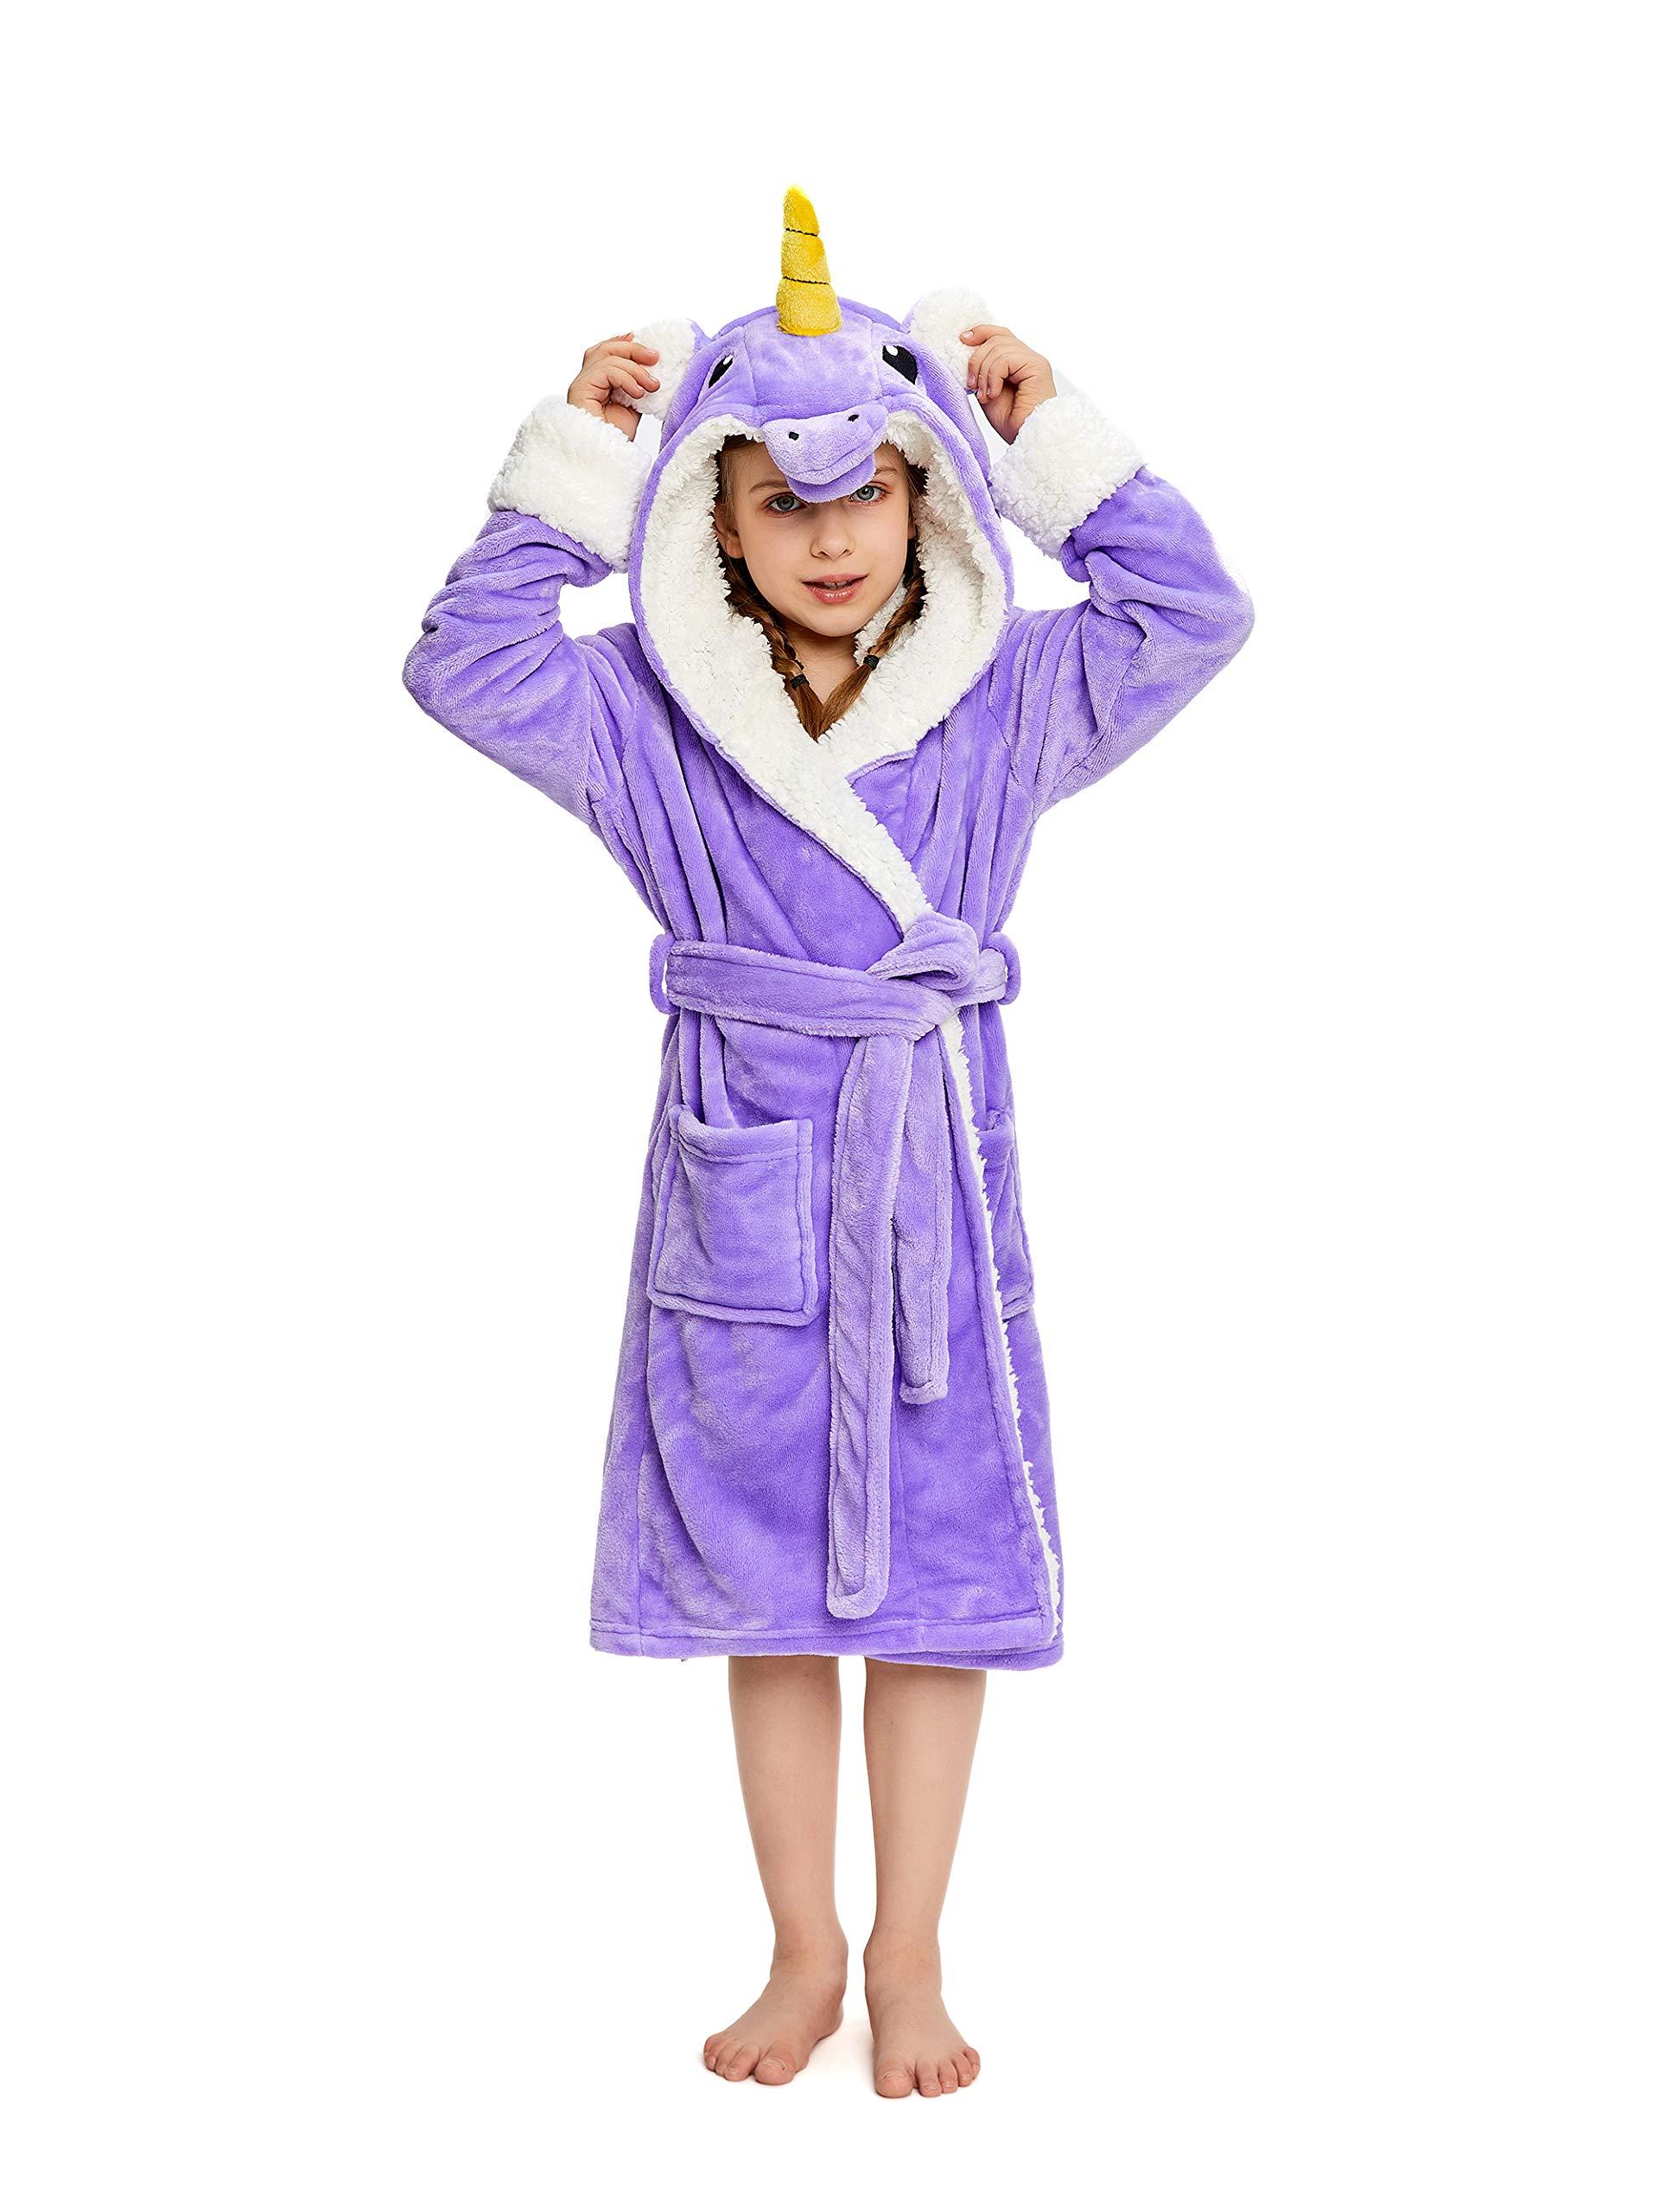 NEWCOSPLAY Unisex Kids Unicorn Plush and Soft Fleece Bathrobe (11-12 Years, Purple Unicorn) by NEWCOSPLAY